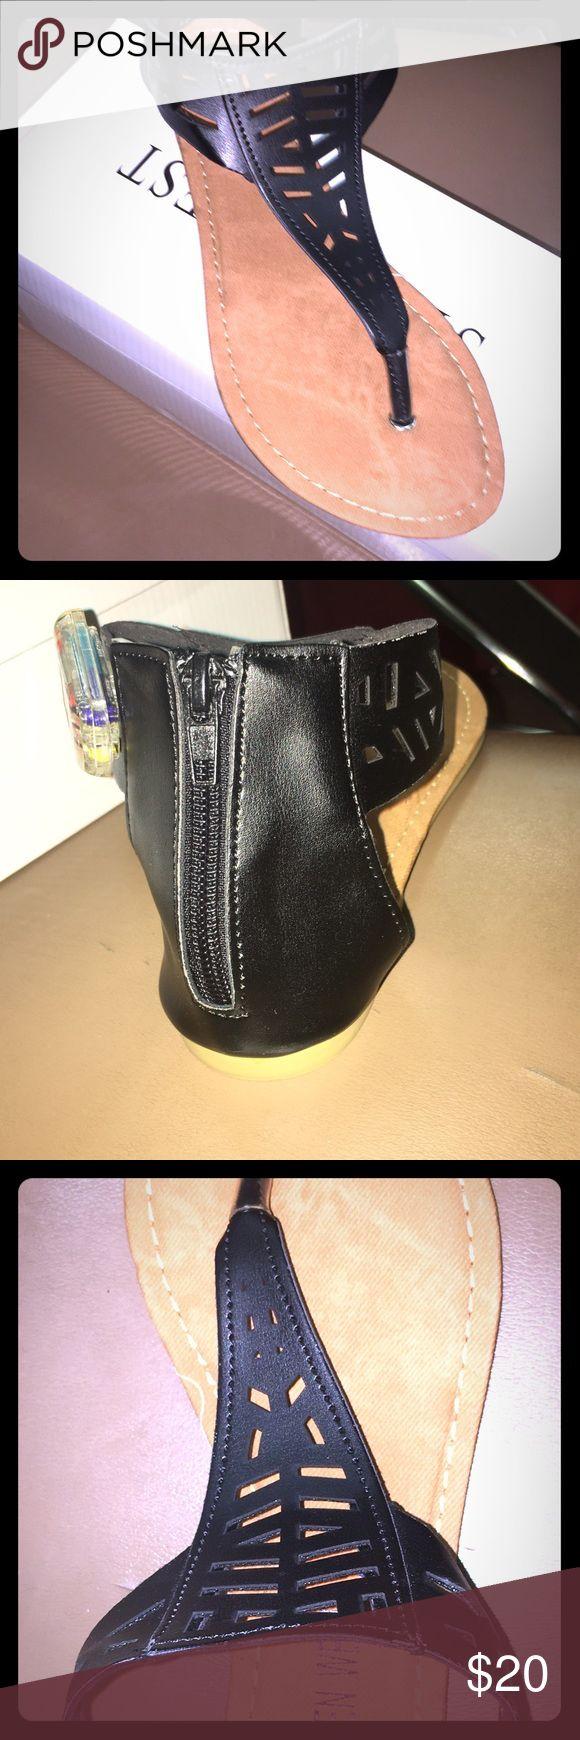 Black sandals for sale - Boho Festival Sandal Sale This Tribal Style Design Boho Sandals